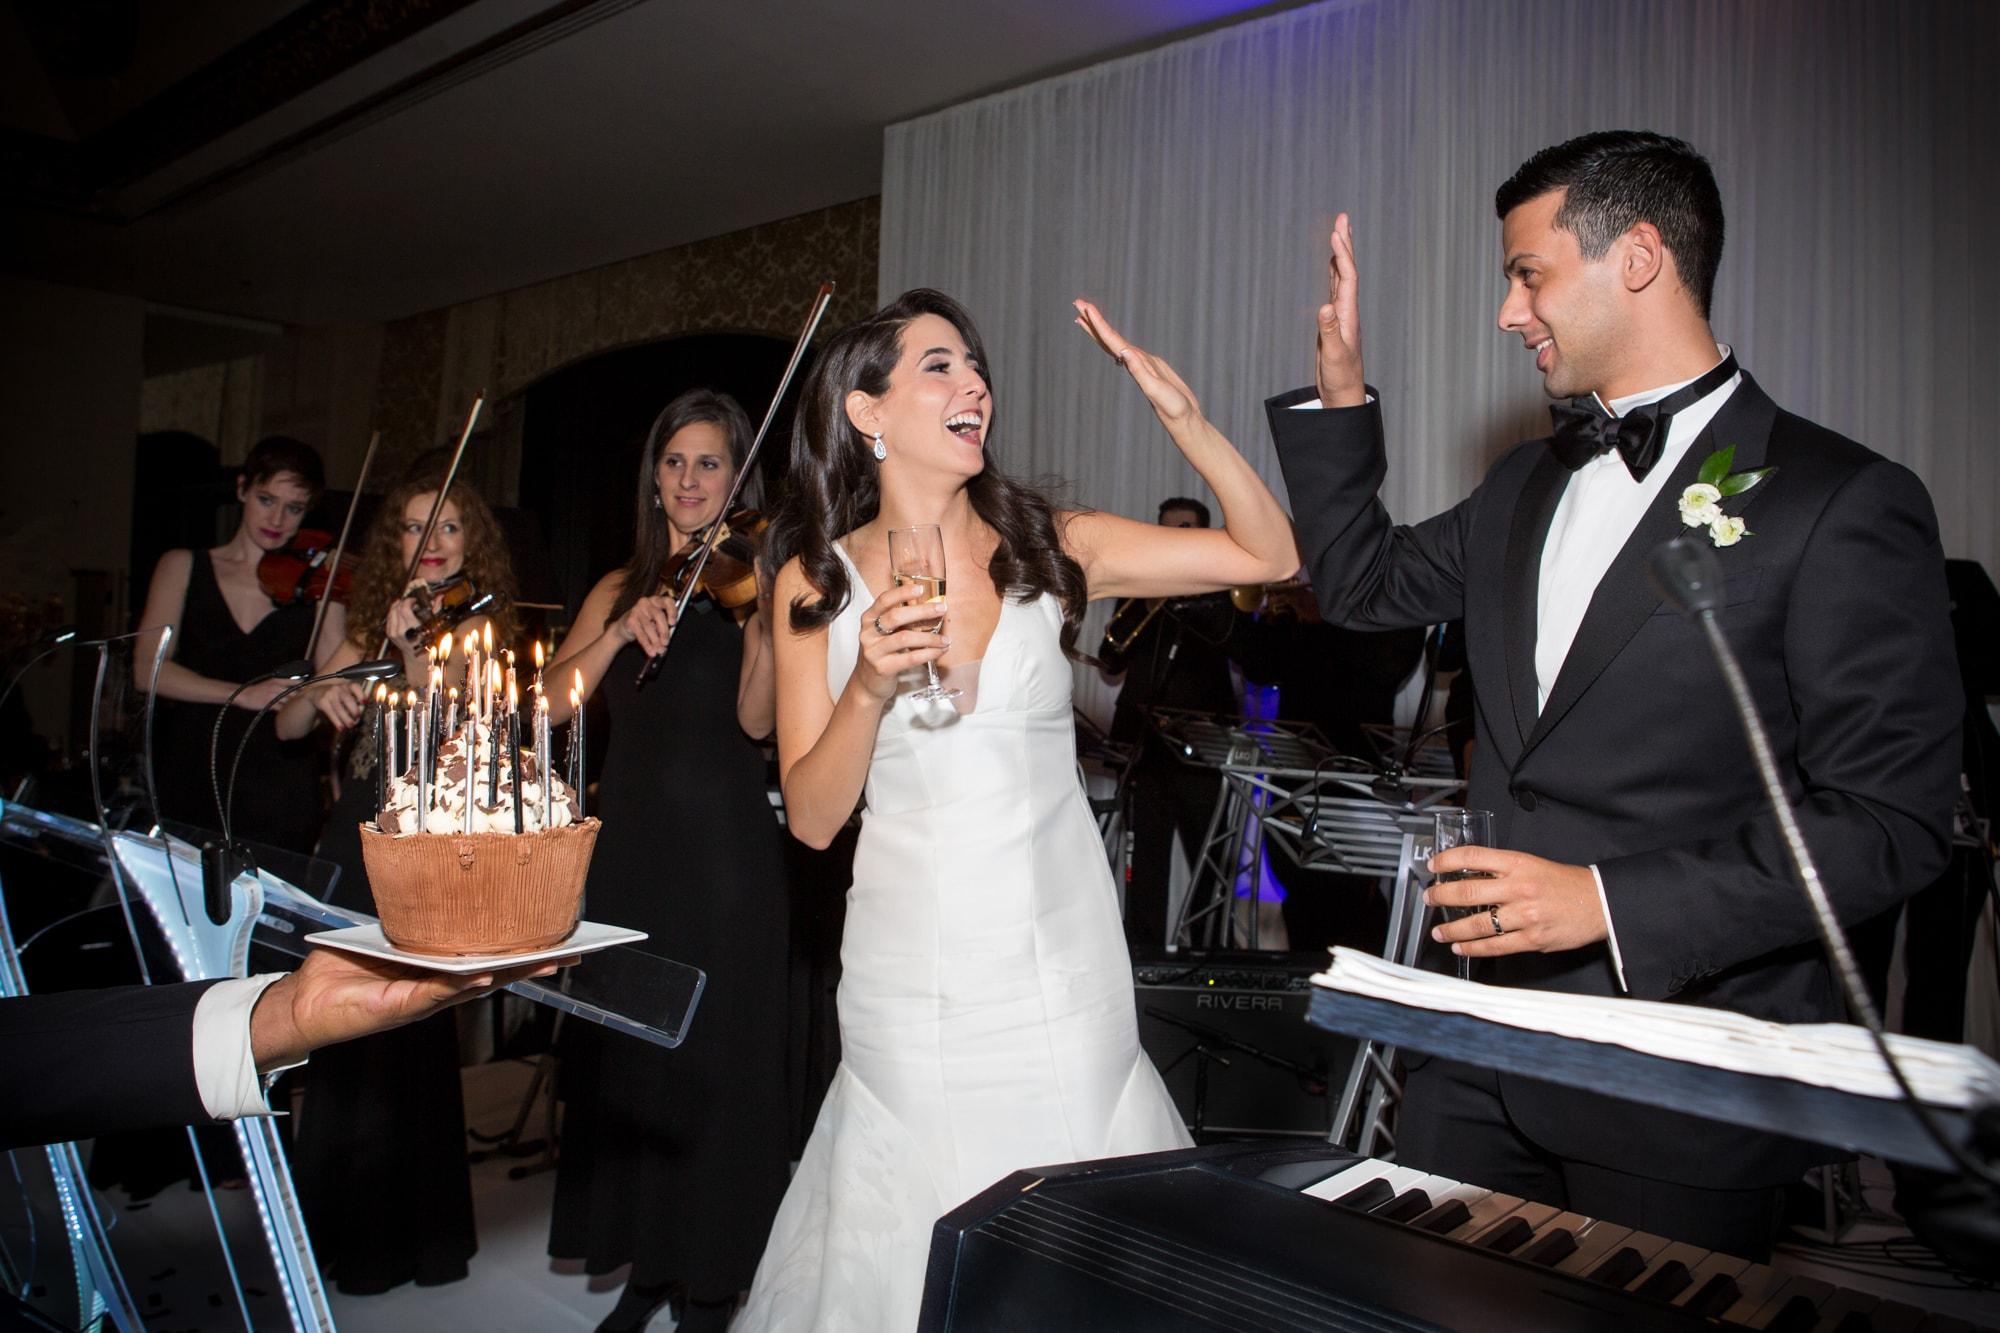 Bride receives birthday cake at wedding reception